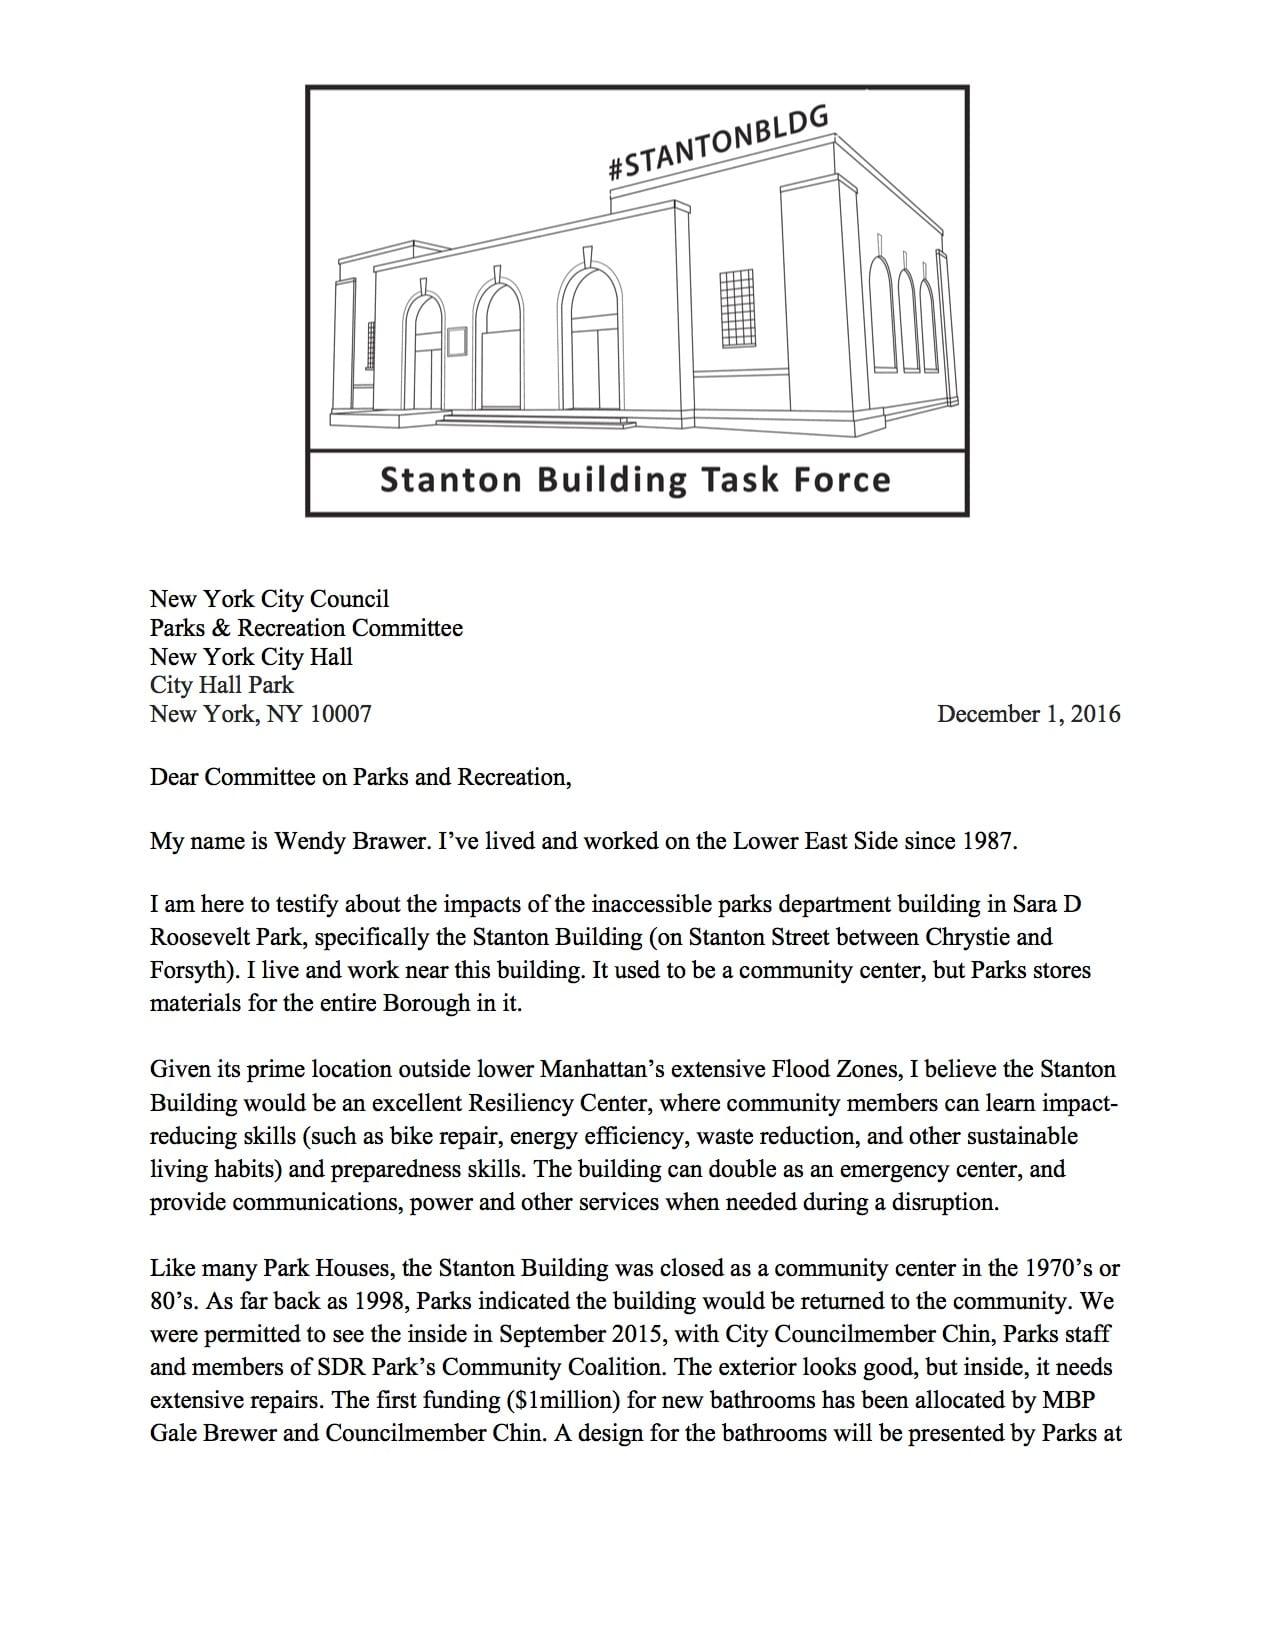 wendy-1stanton-inaccessibleparksbuilding-letter-brawer-12-16